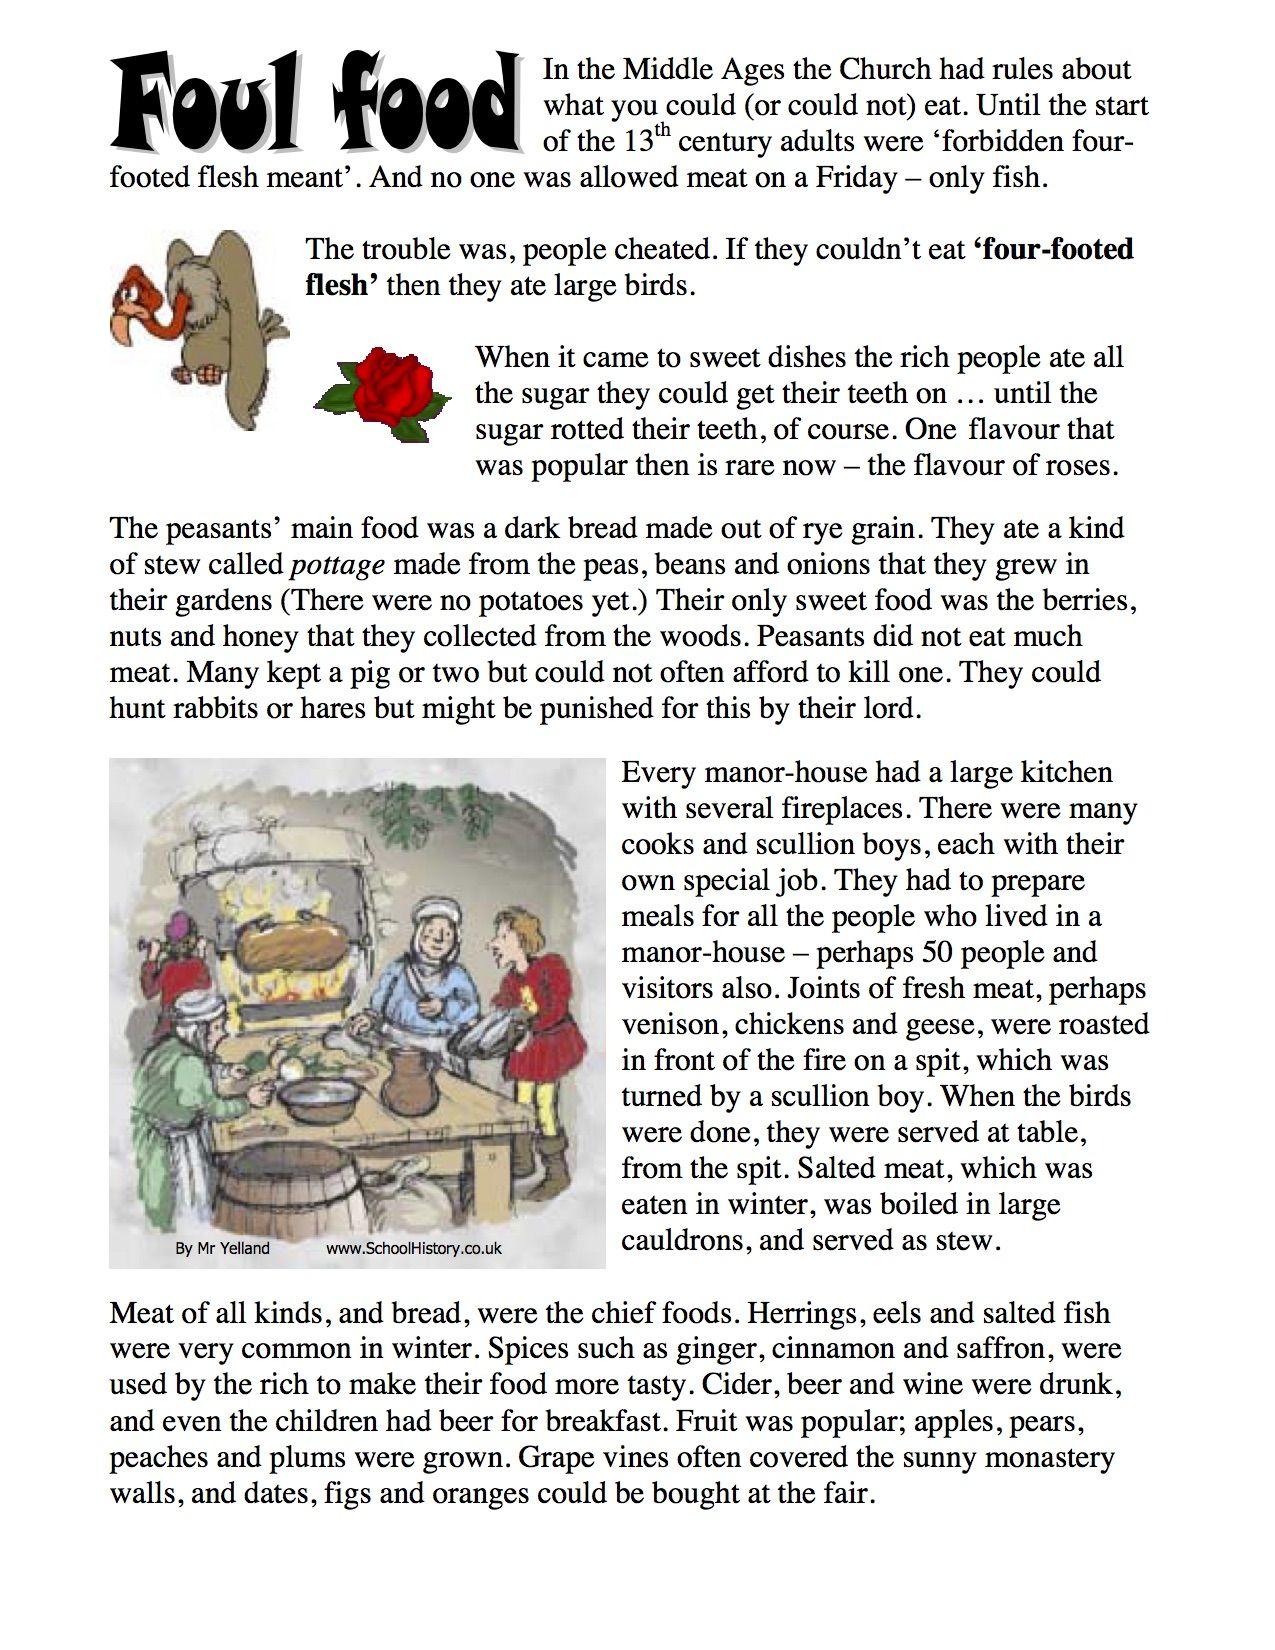 Free History Worksheets | KS3 & KS4 Lesson Plans & Resources ...